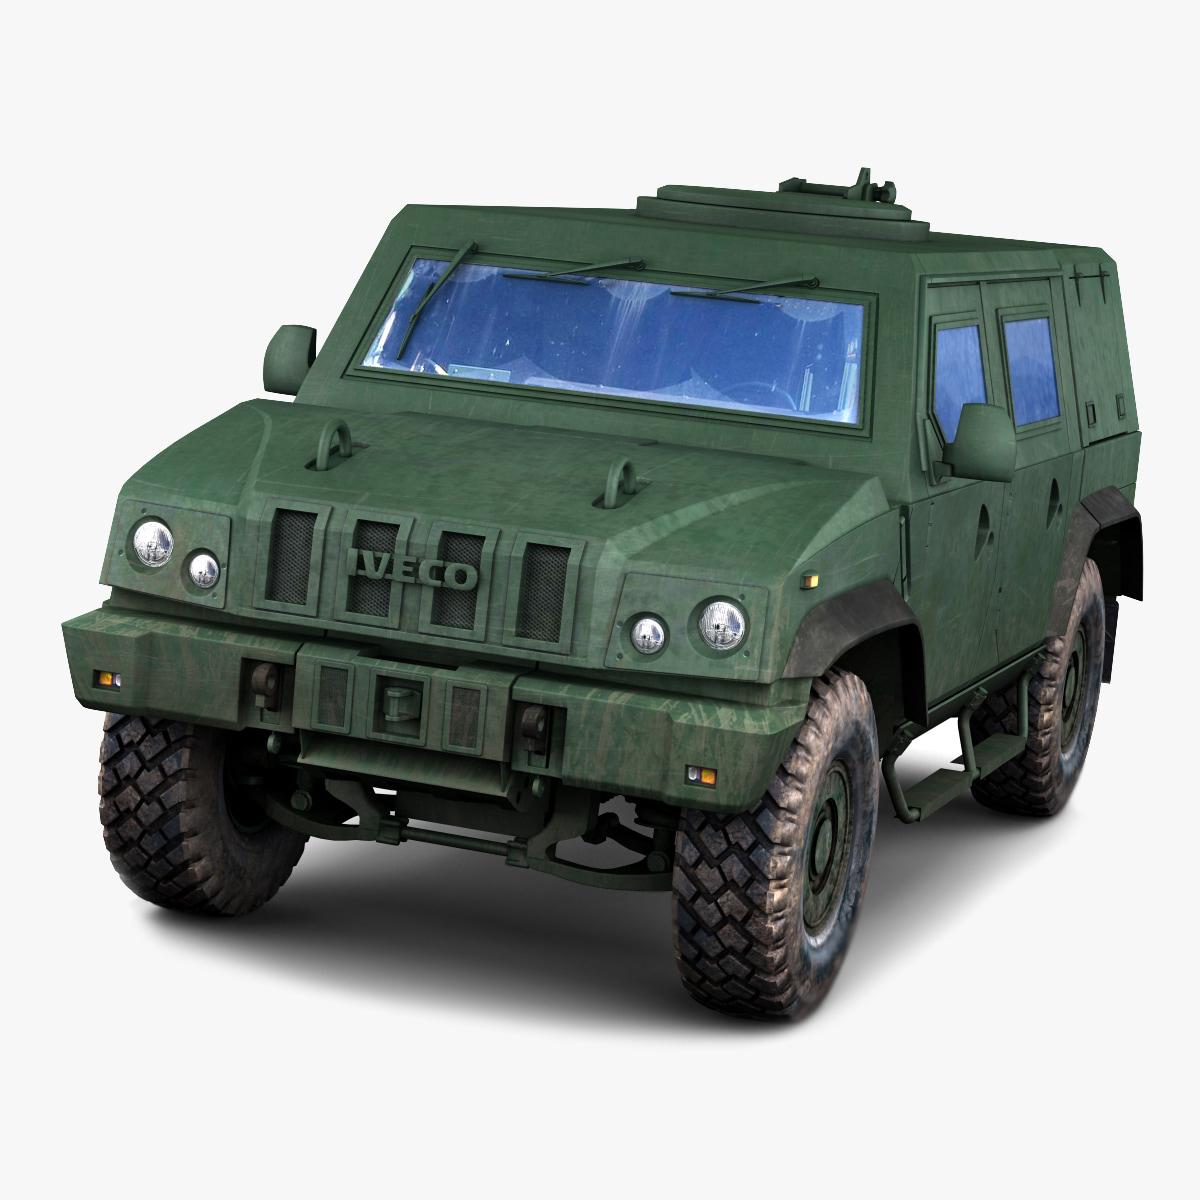 Infantry_Mobility_Vehicle_Iveco_LMV_000.jpg